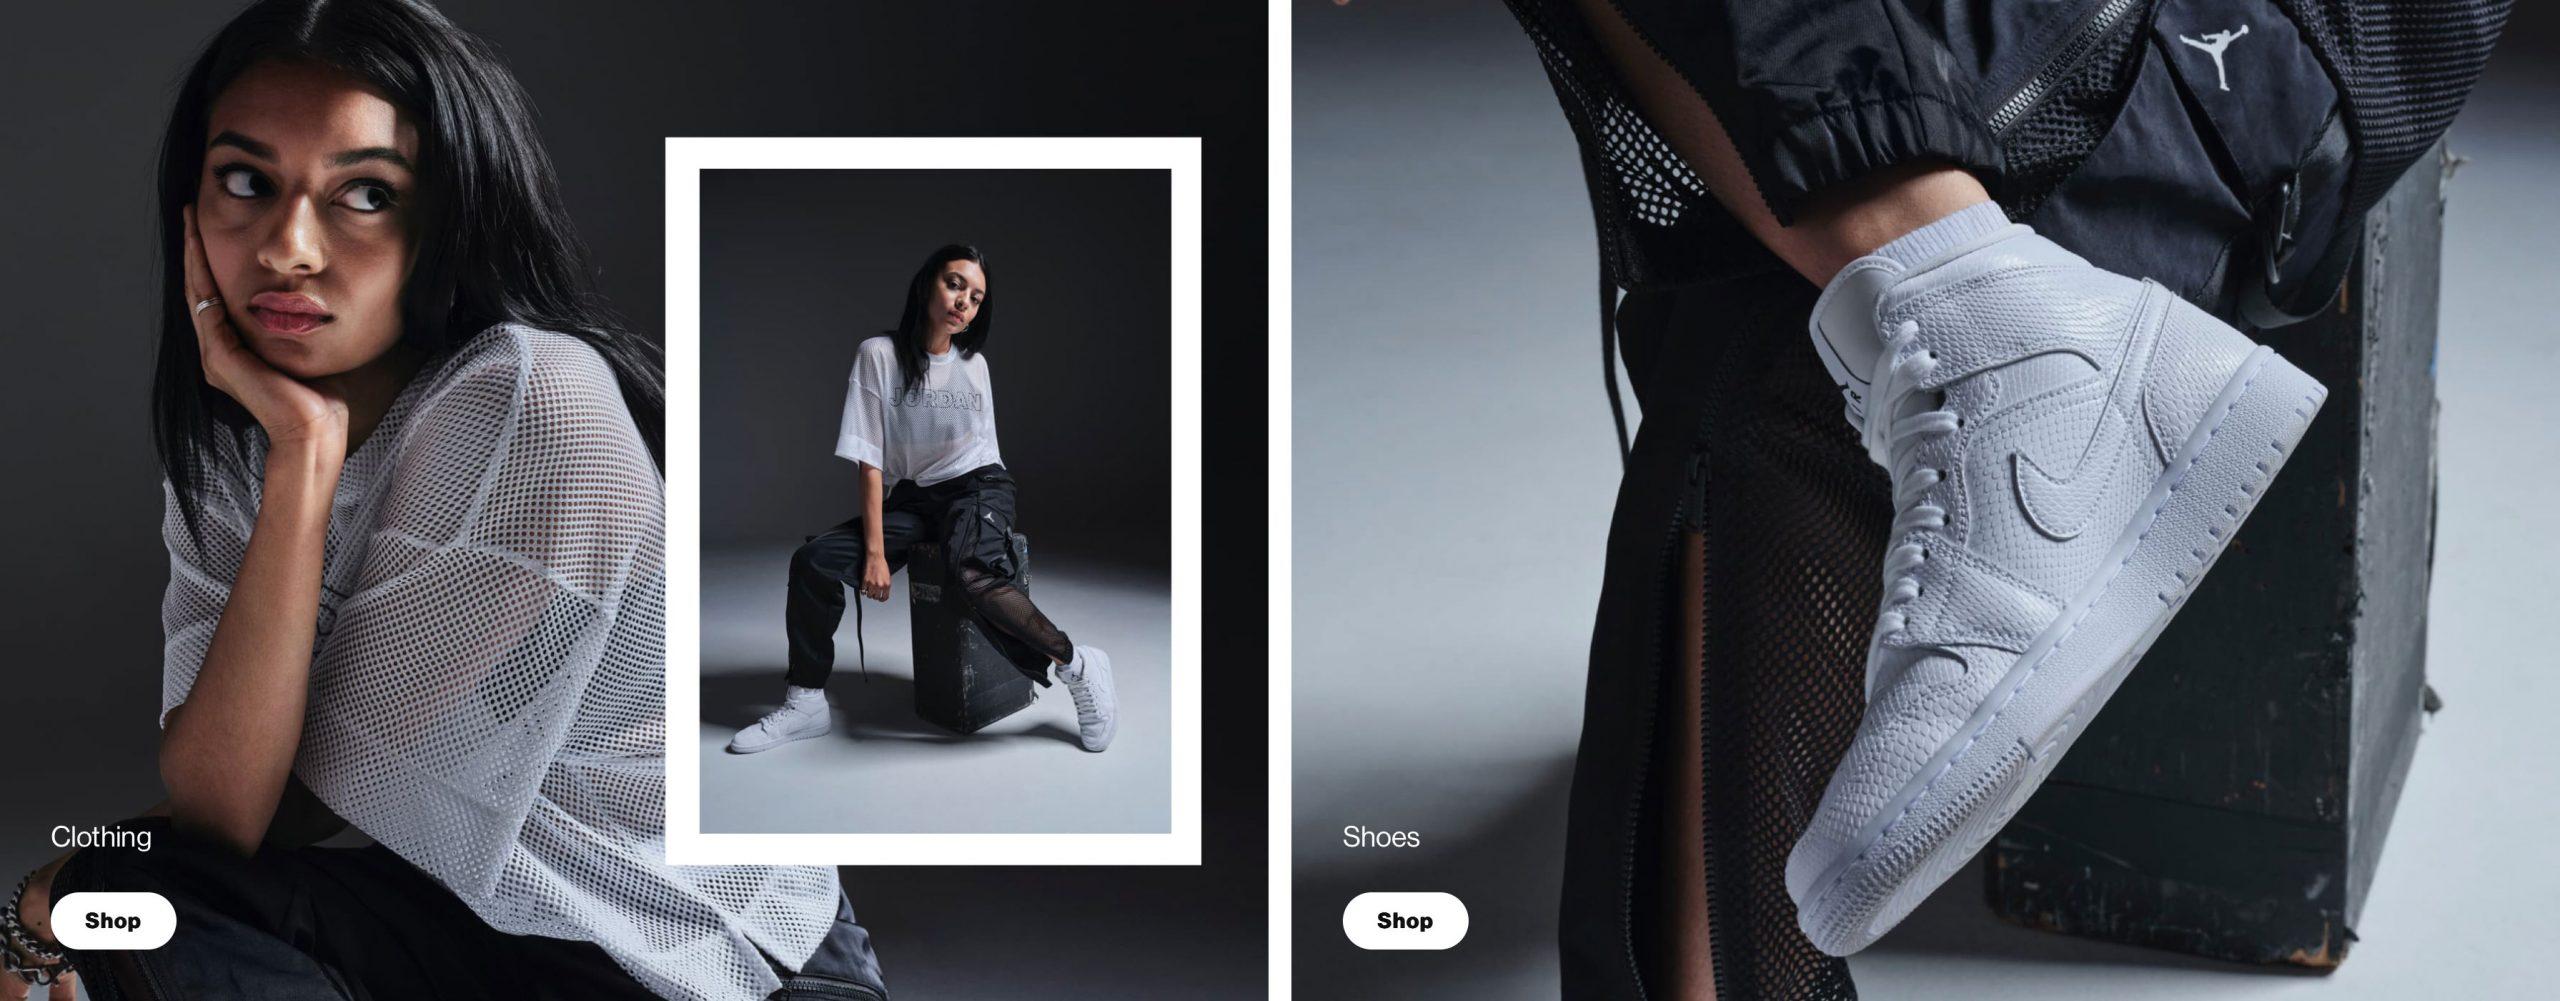 jordan-womens-utility-apparel-shoes